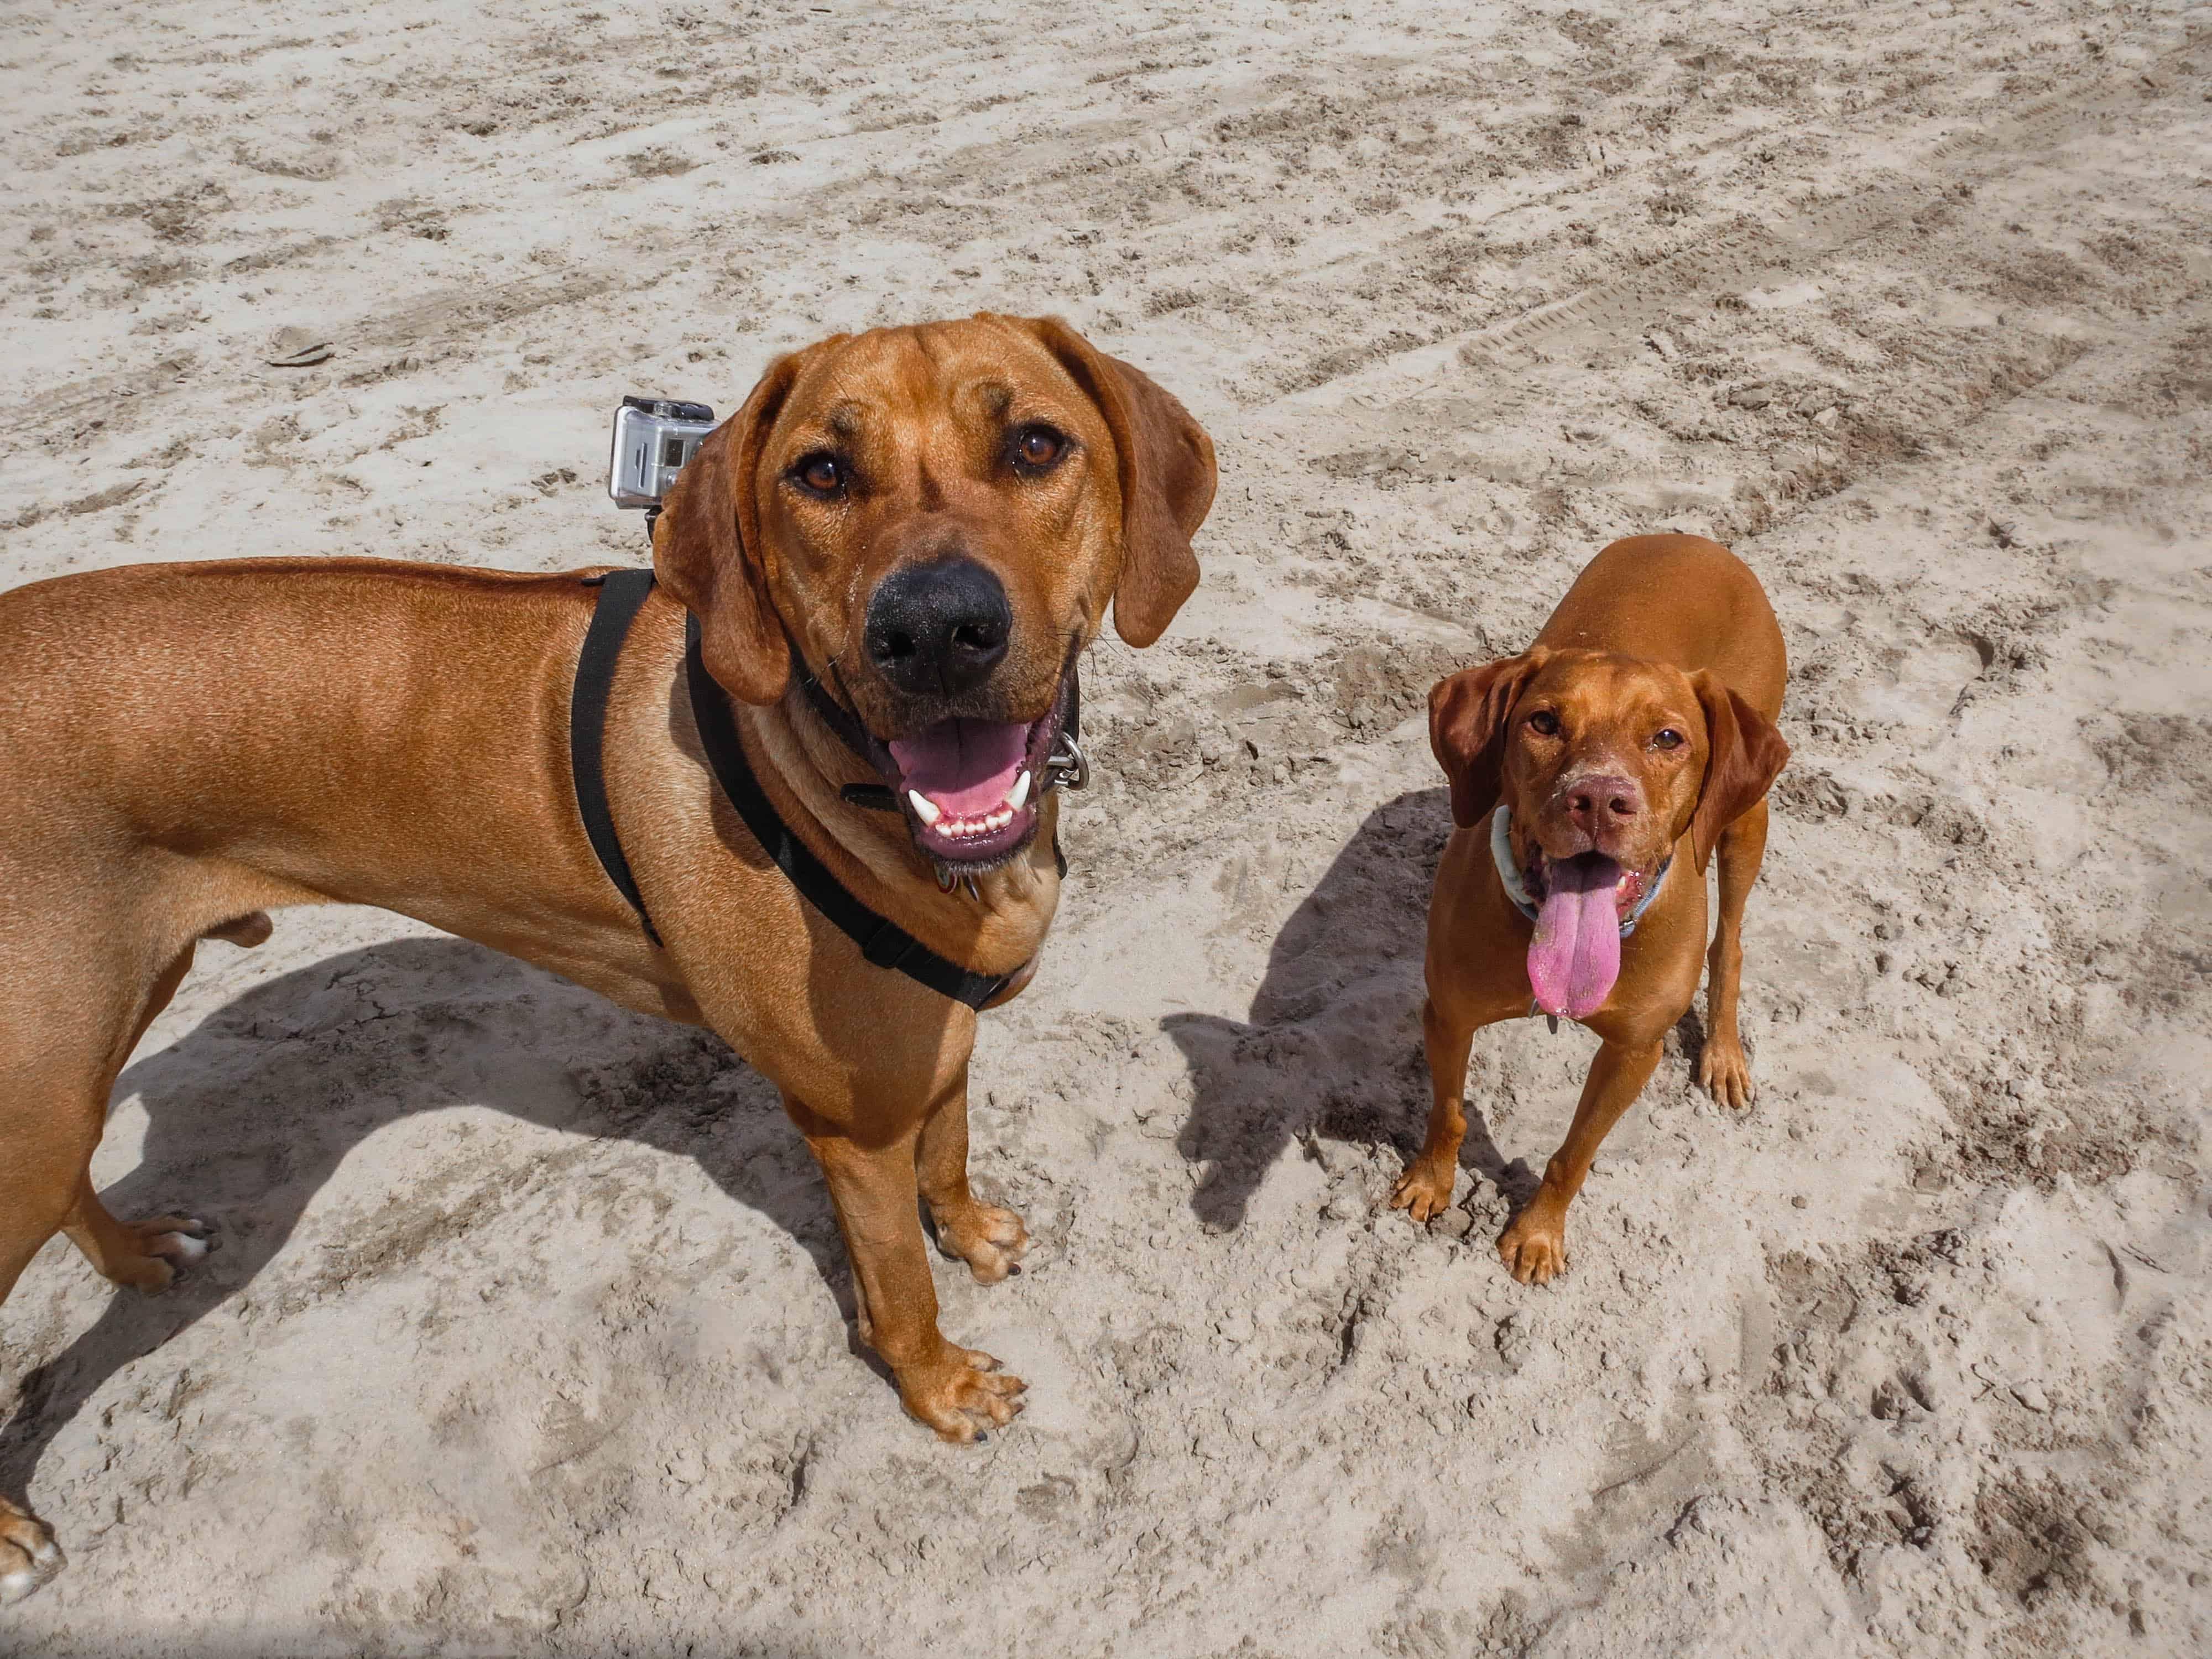 Rhodesian Ridgeback, rhodesian ridgeback photos, dog adventure, marking our territory, dog blog, dog photos